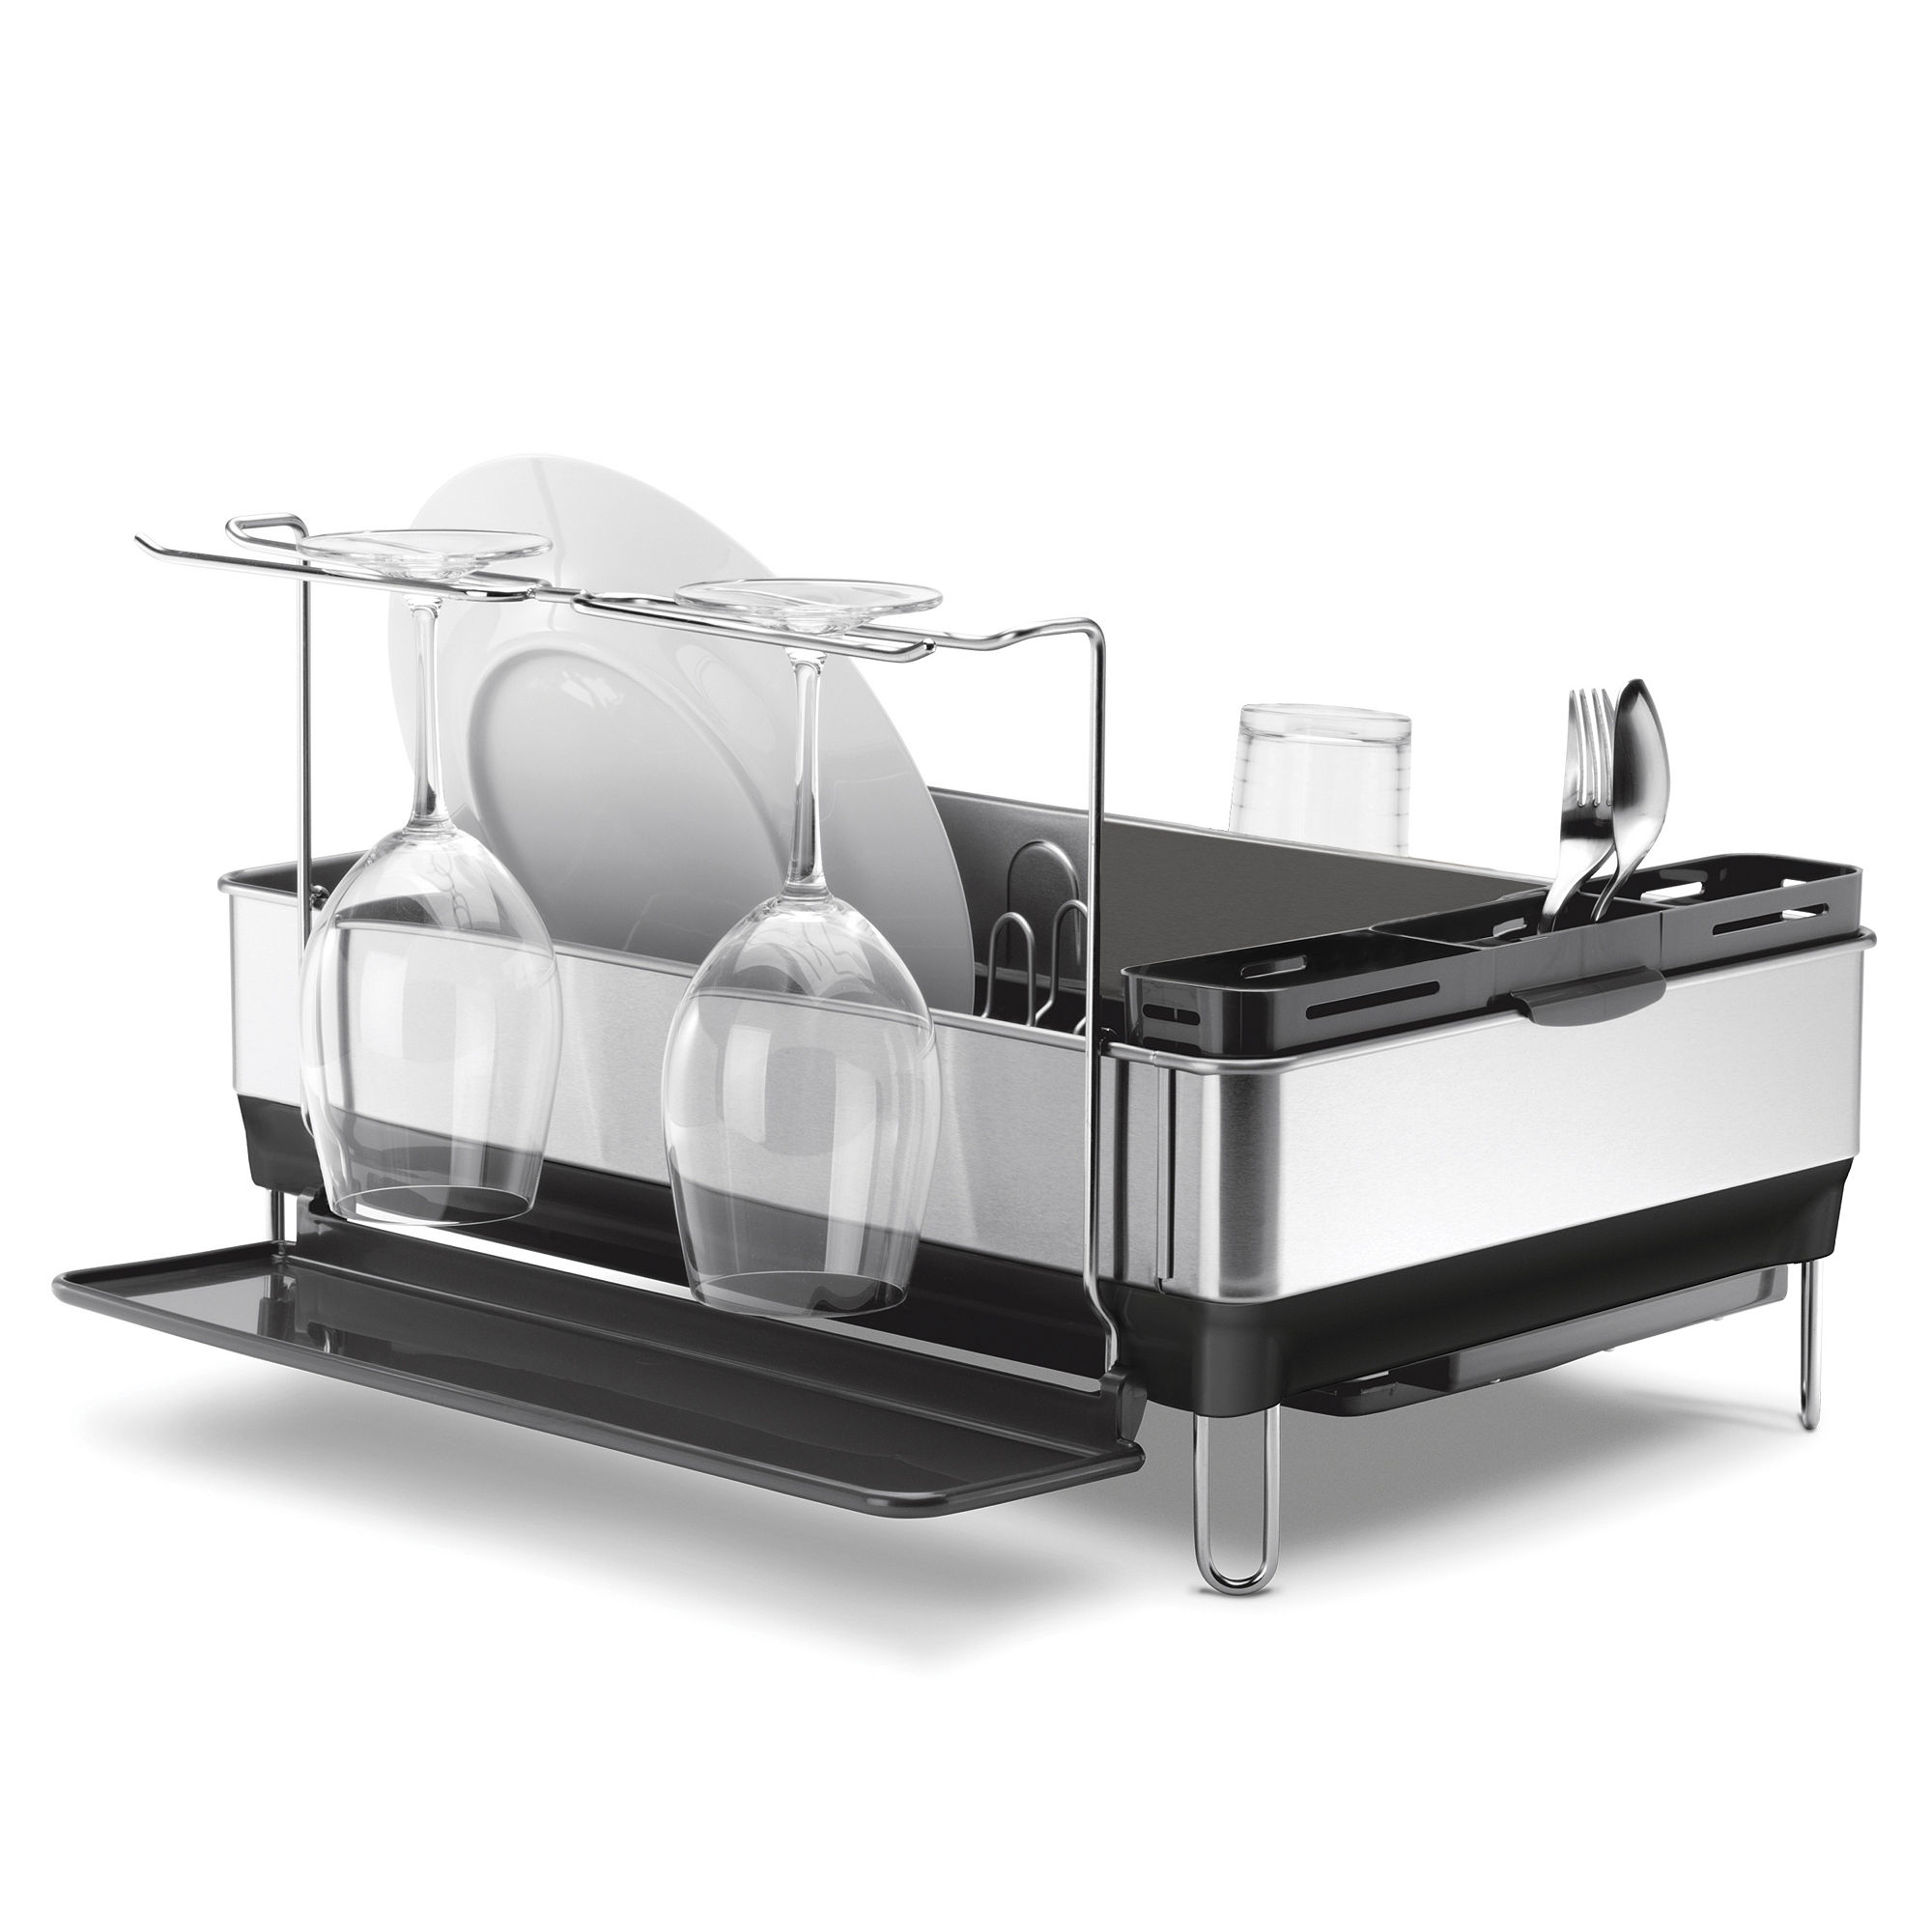 simplehuman Steel Frame Dish Rack + Wine Glass Holder